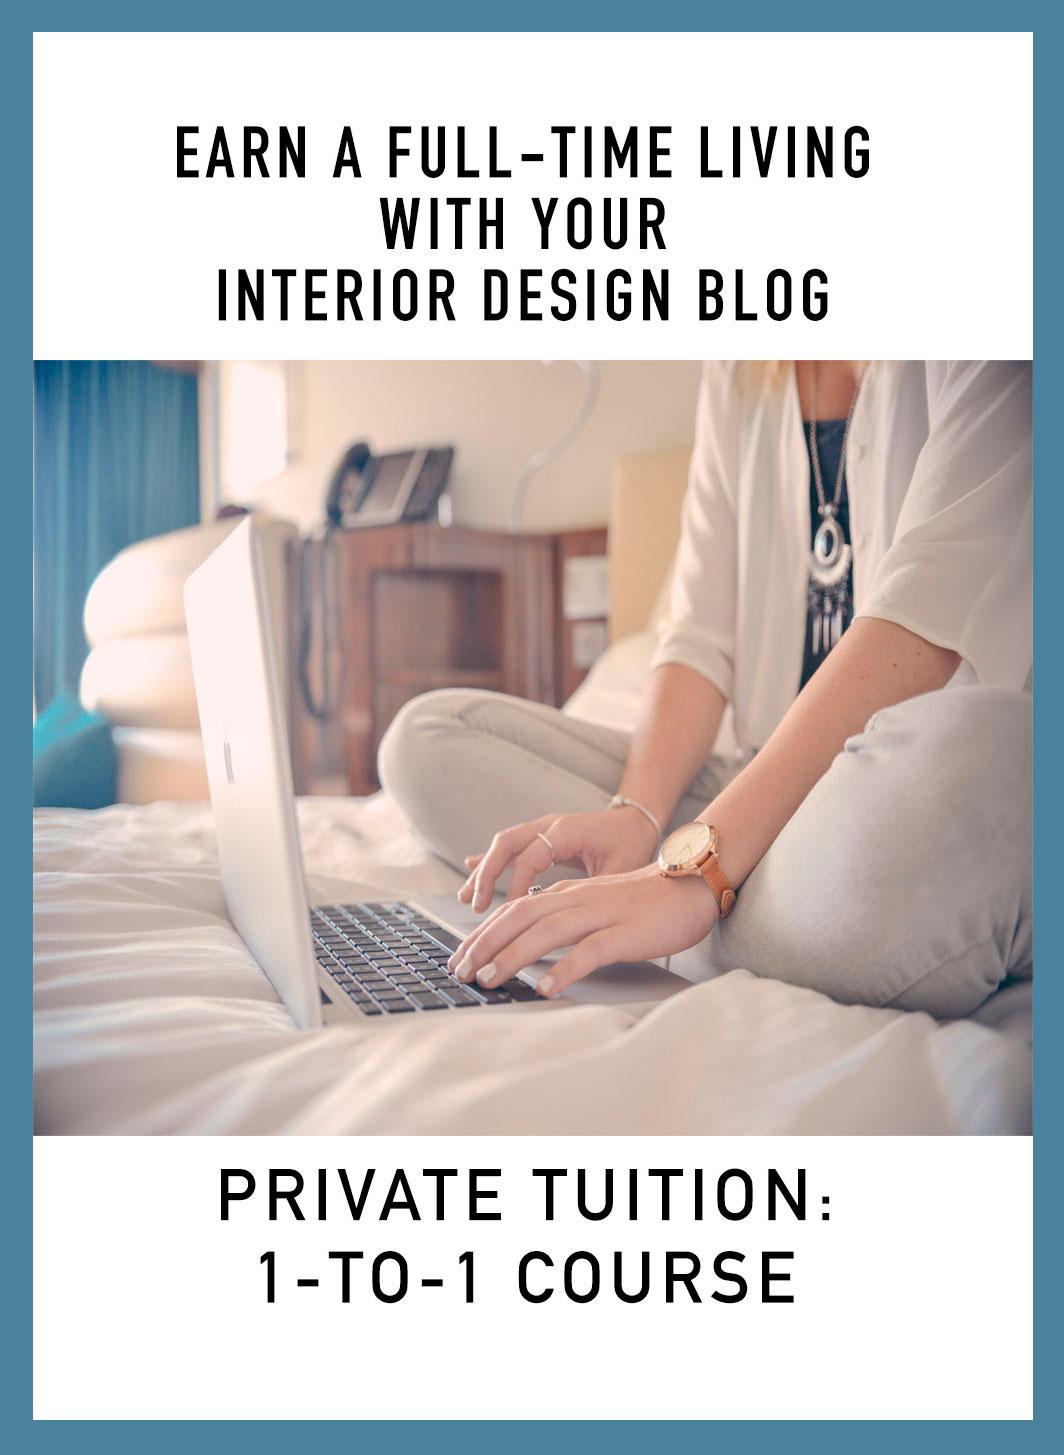 Monetize your interior design blog